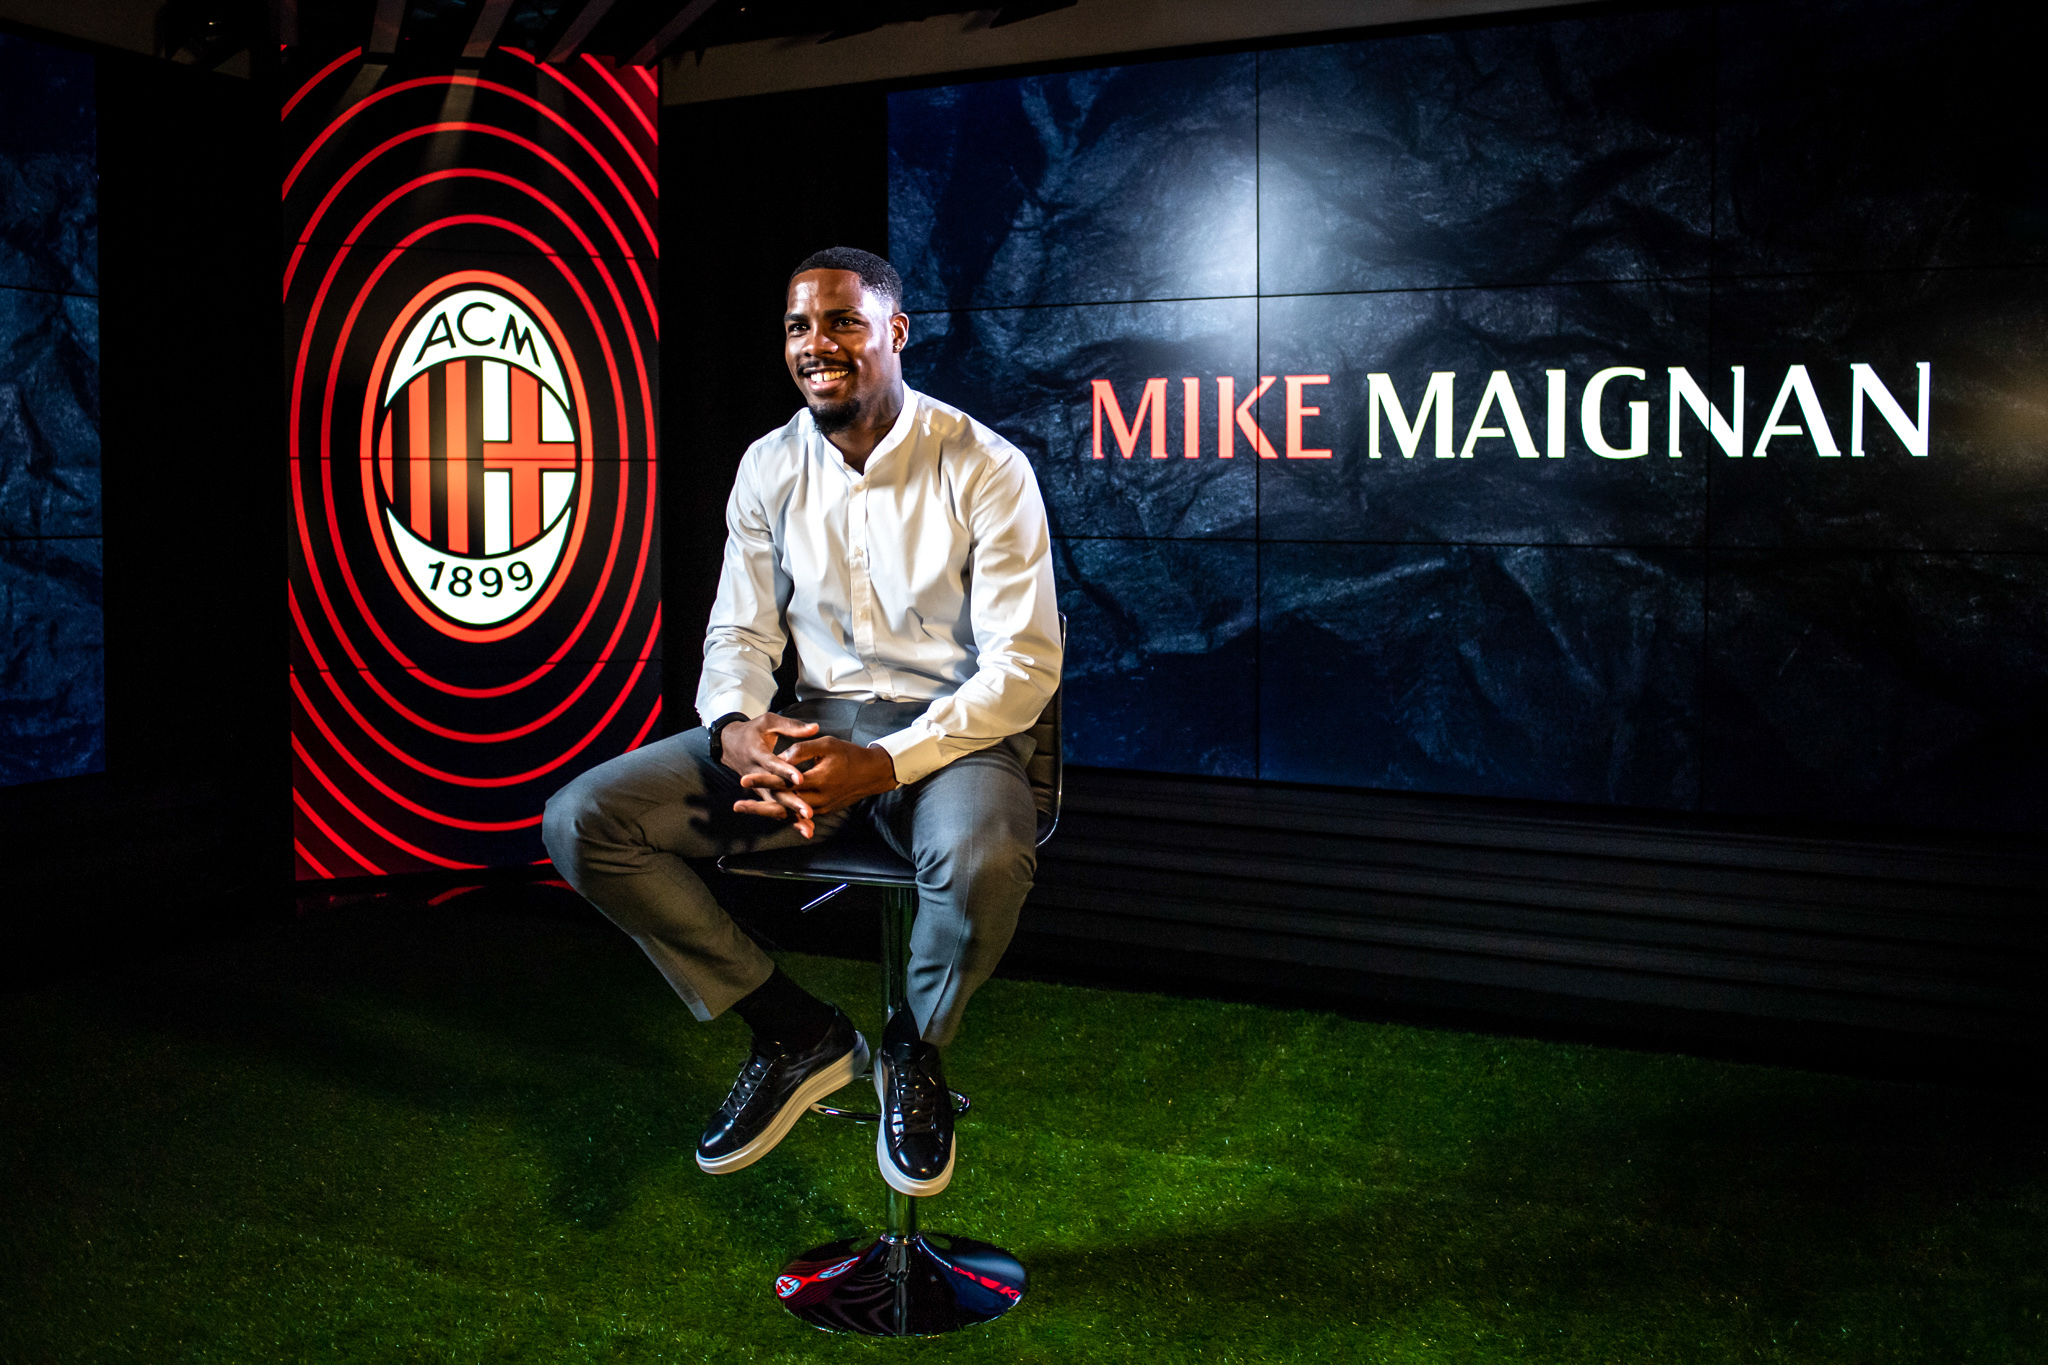 Mike Maignan retrouvera Milan après l'Euro (iconsport)